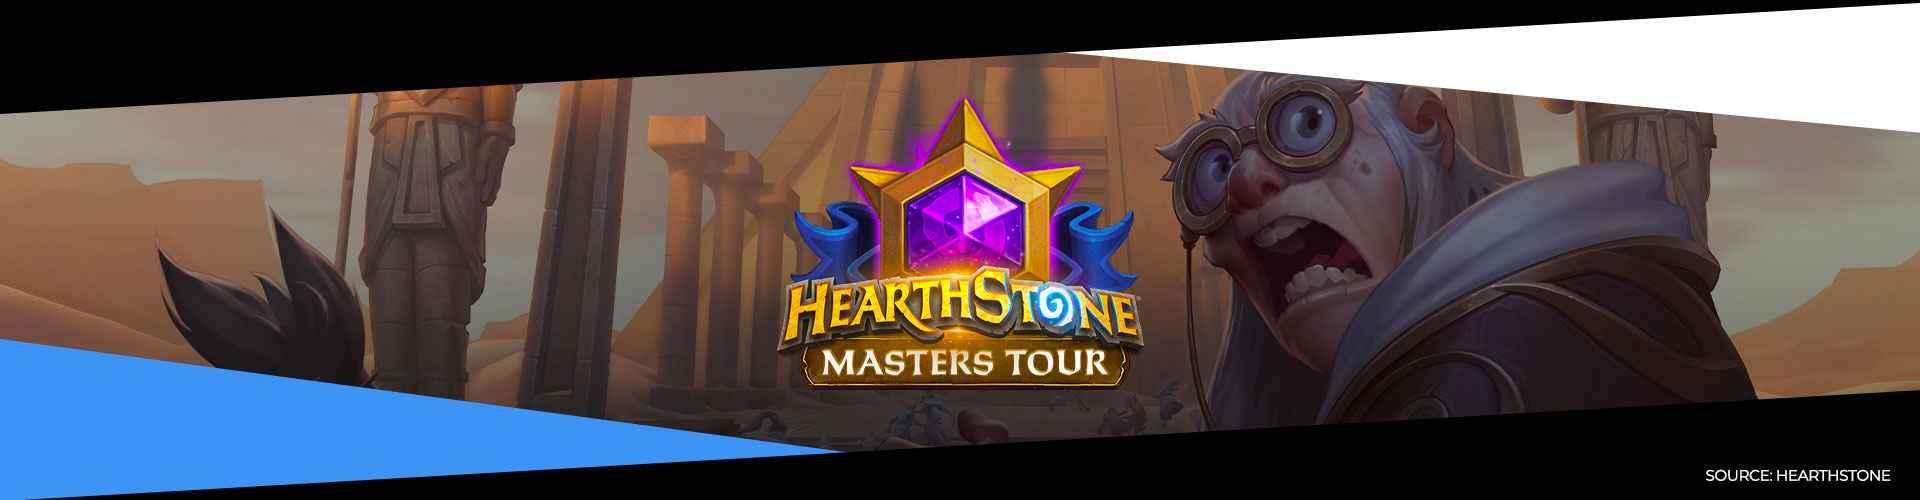 Hearthstone - Masters Tour 2020 Arlington